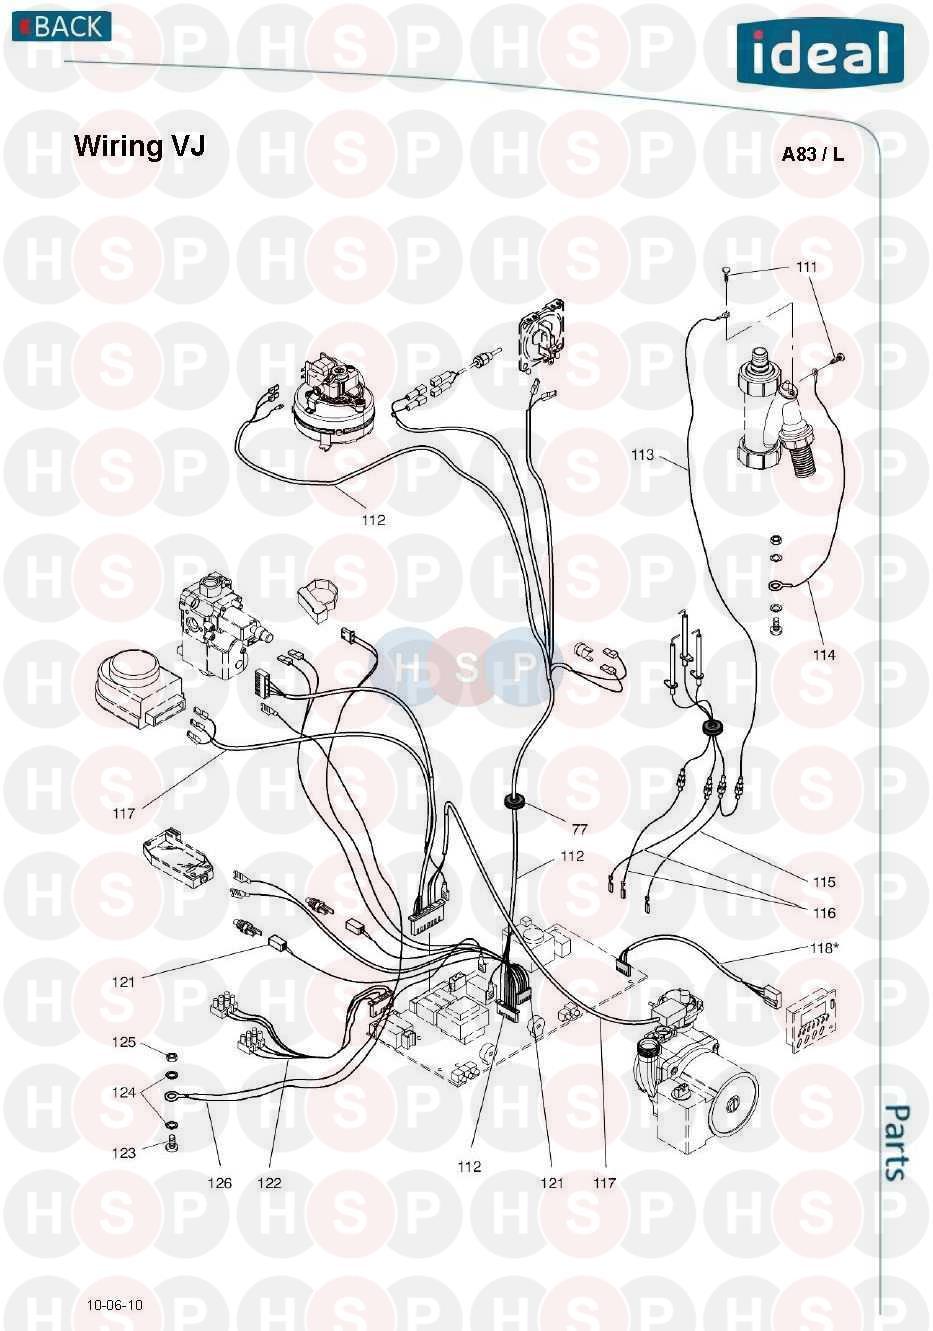 ideal mini he c24 wiring vj diagram heating spare parts. Black Bedroom Furniture Sets. Home Design Ideas